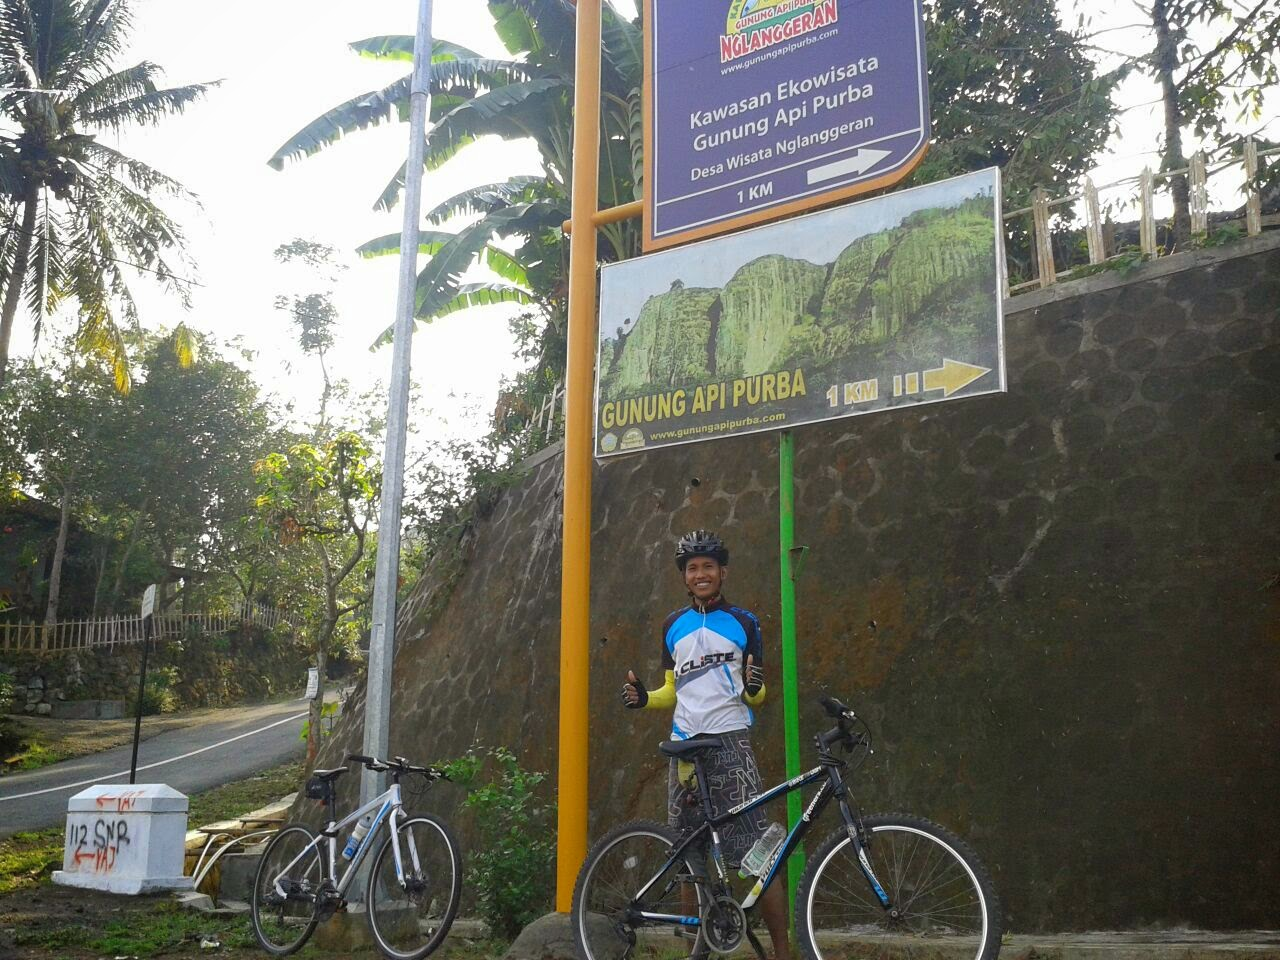 Area Gunung Api Purba, Nglanggeran, Gunung Kidul